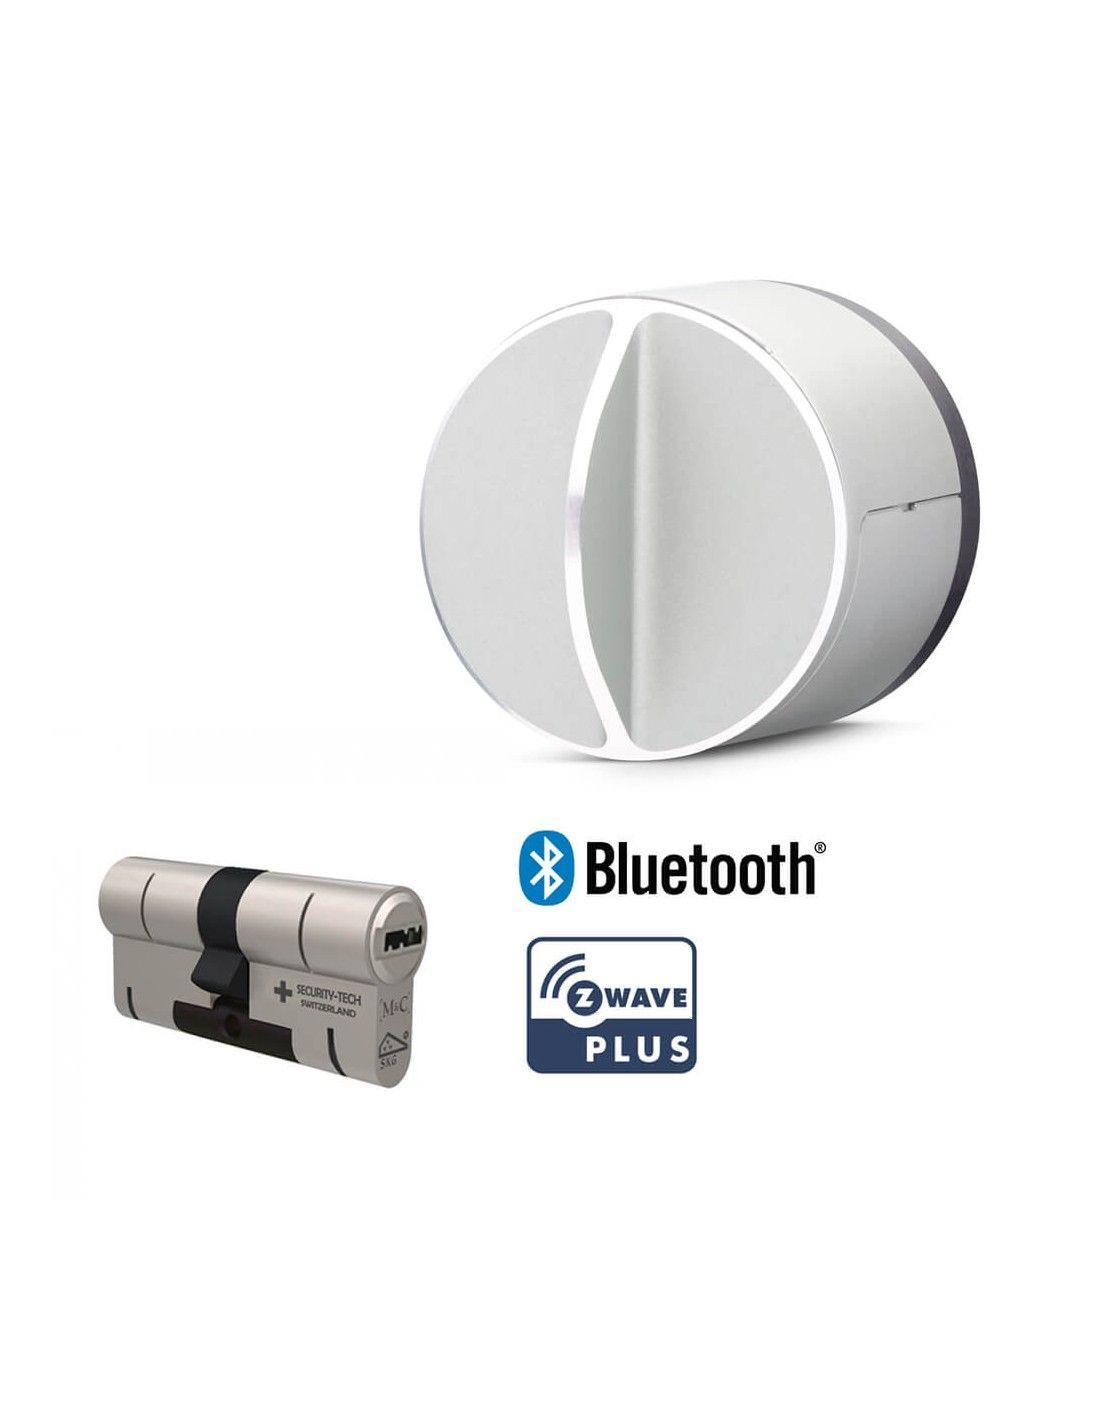 Danalock - Danalock V3 (Z-Wave/Bluetooth) + Secure